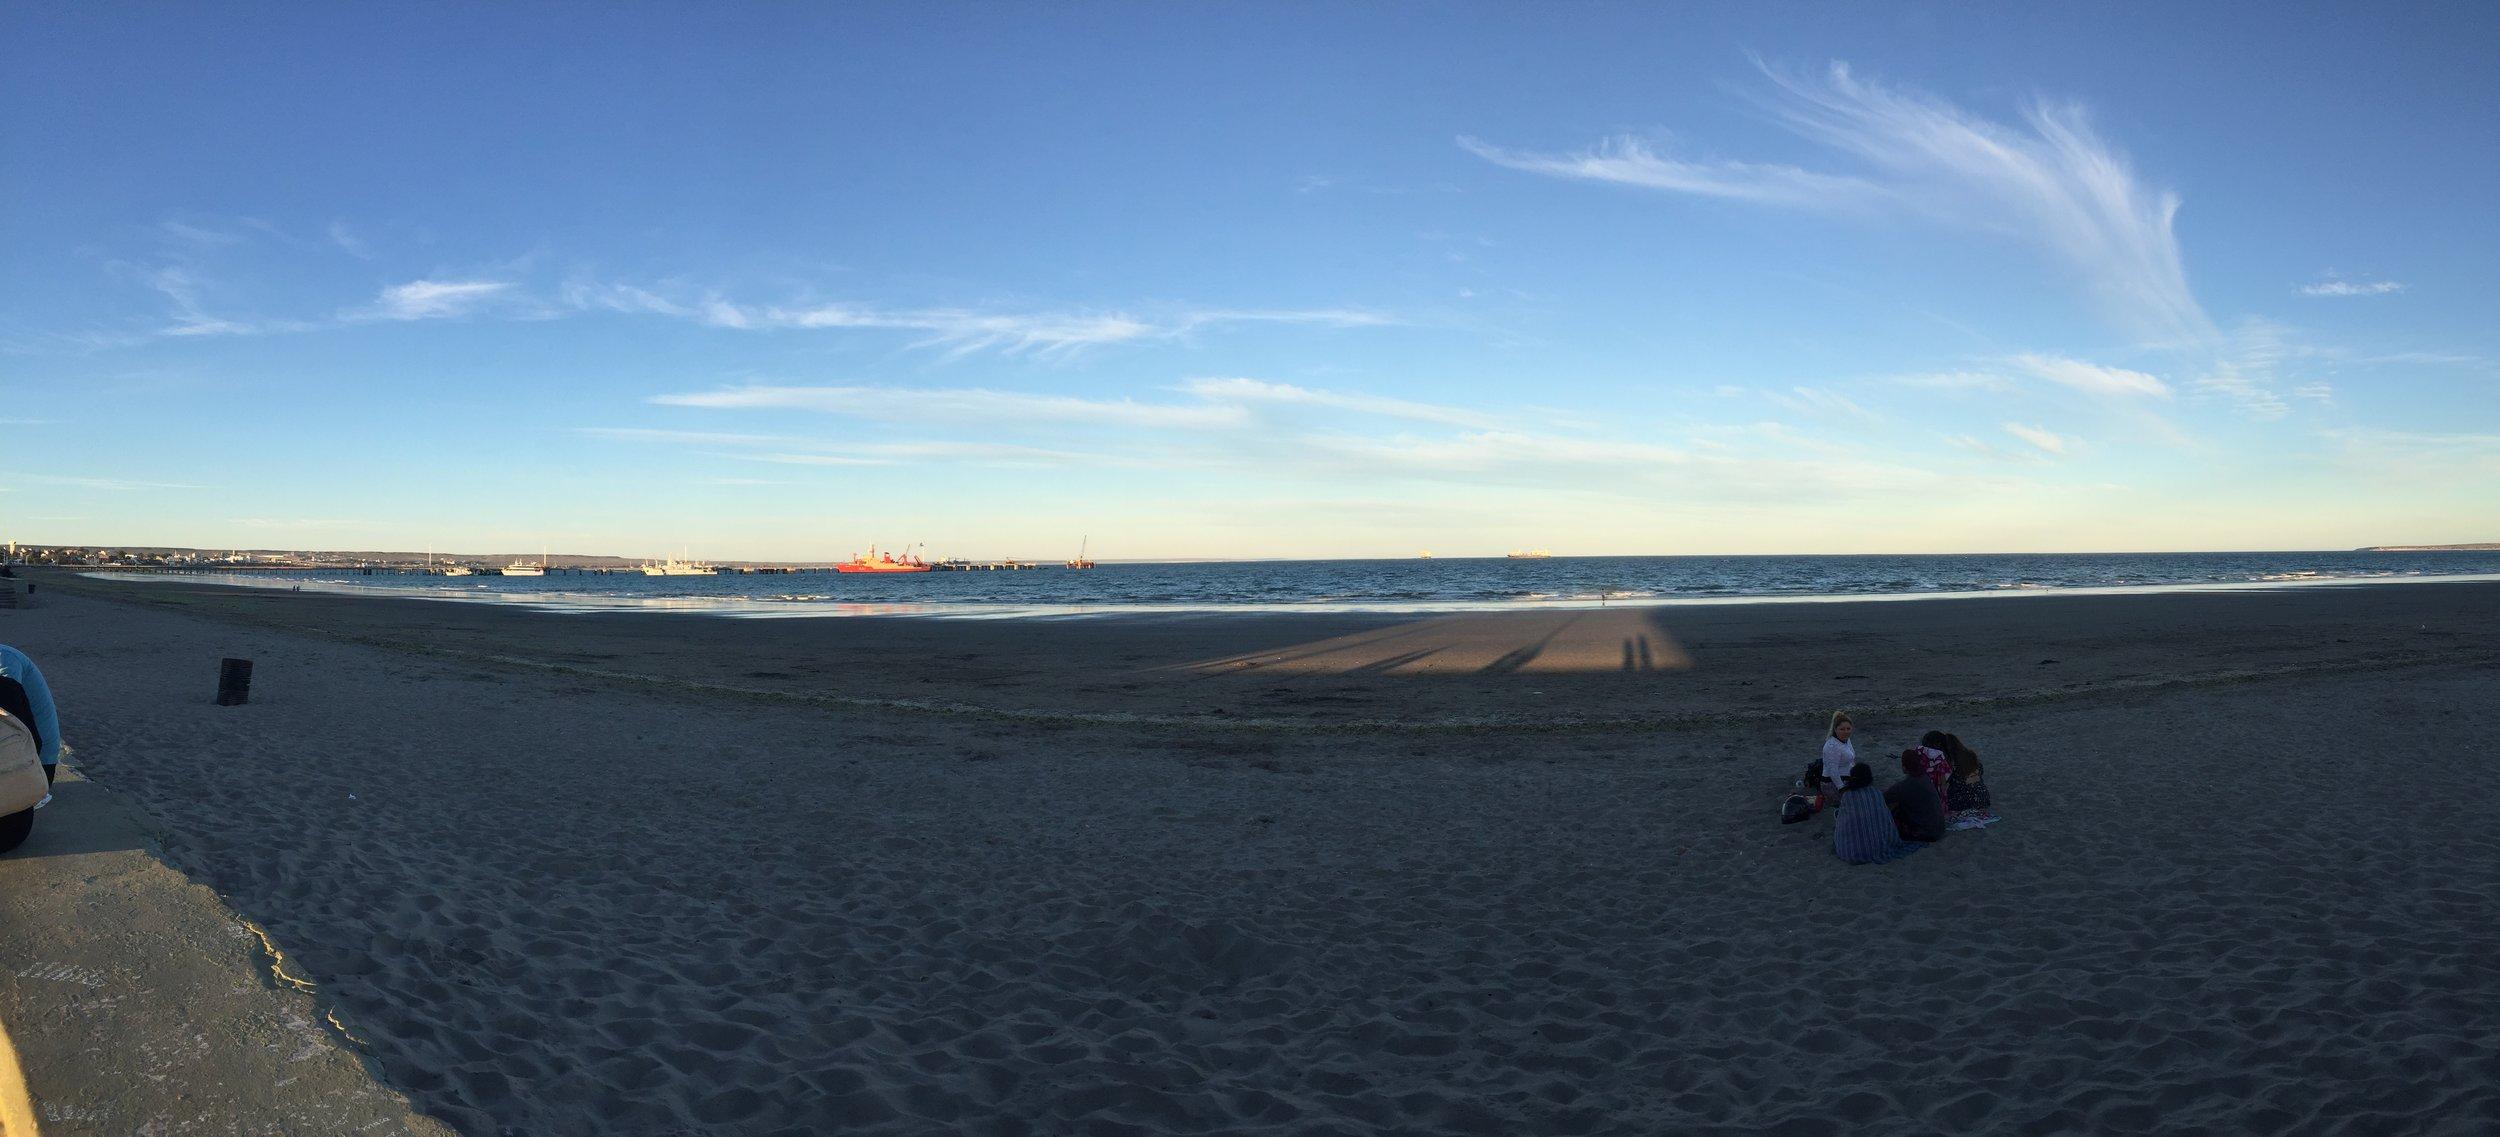 Golfo Nuevo Bay at Sunset